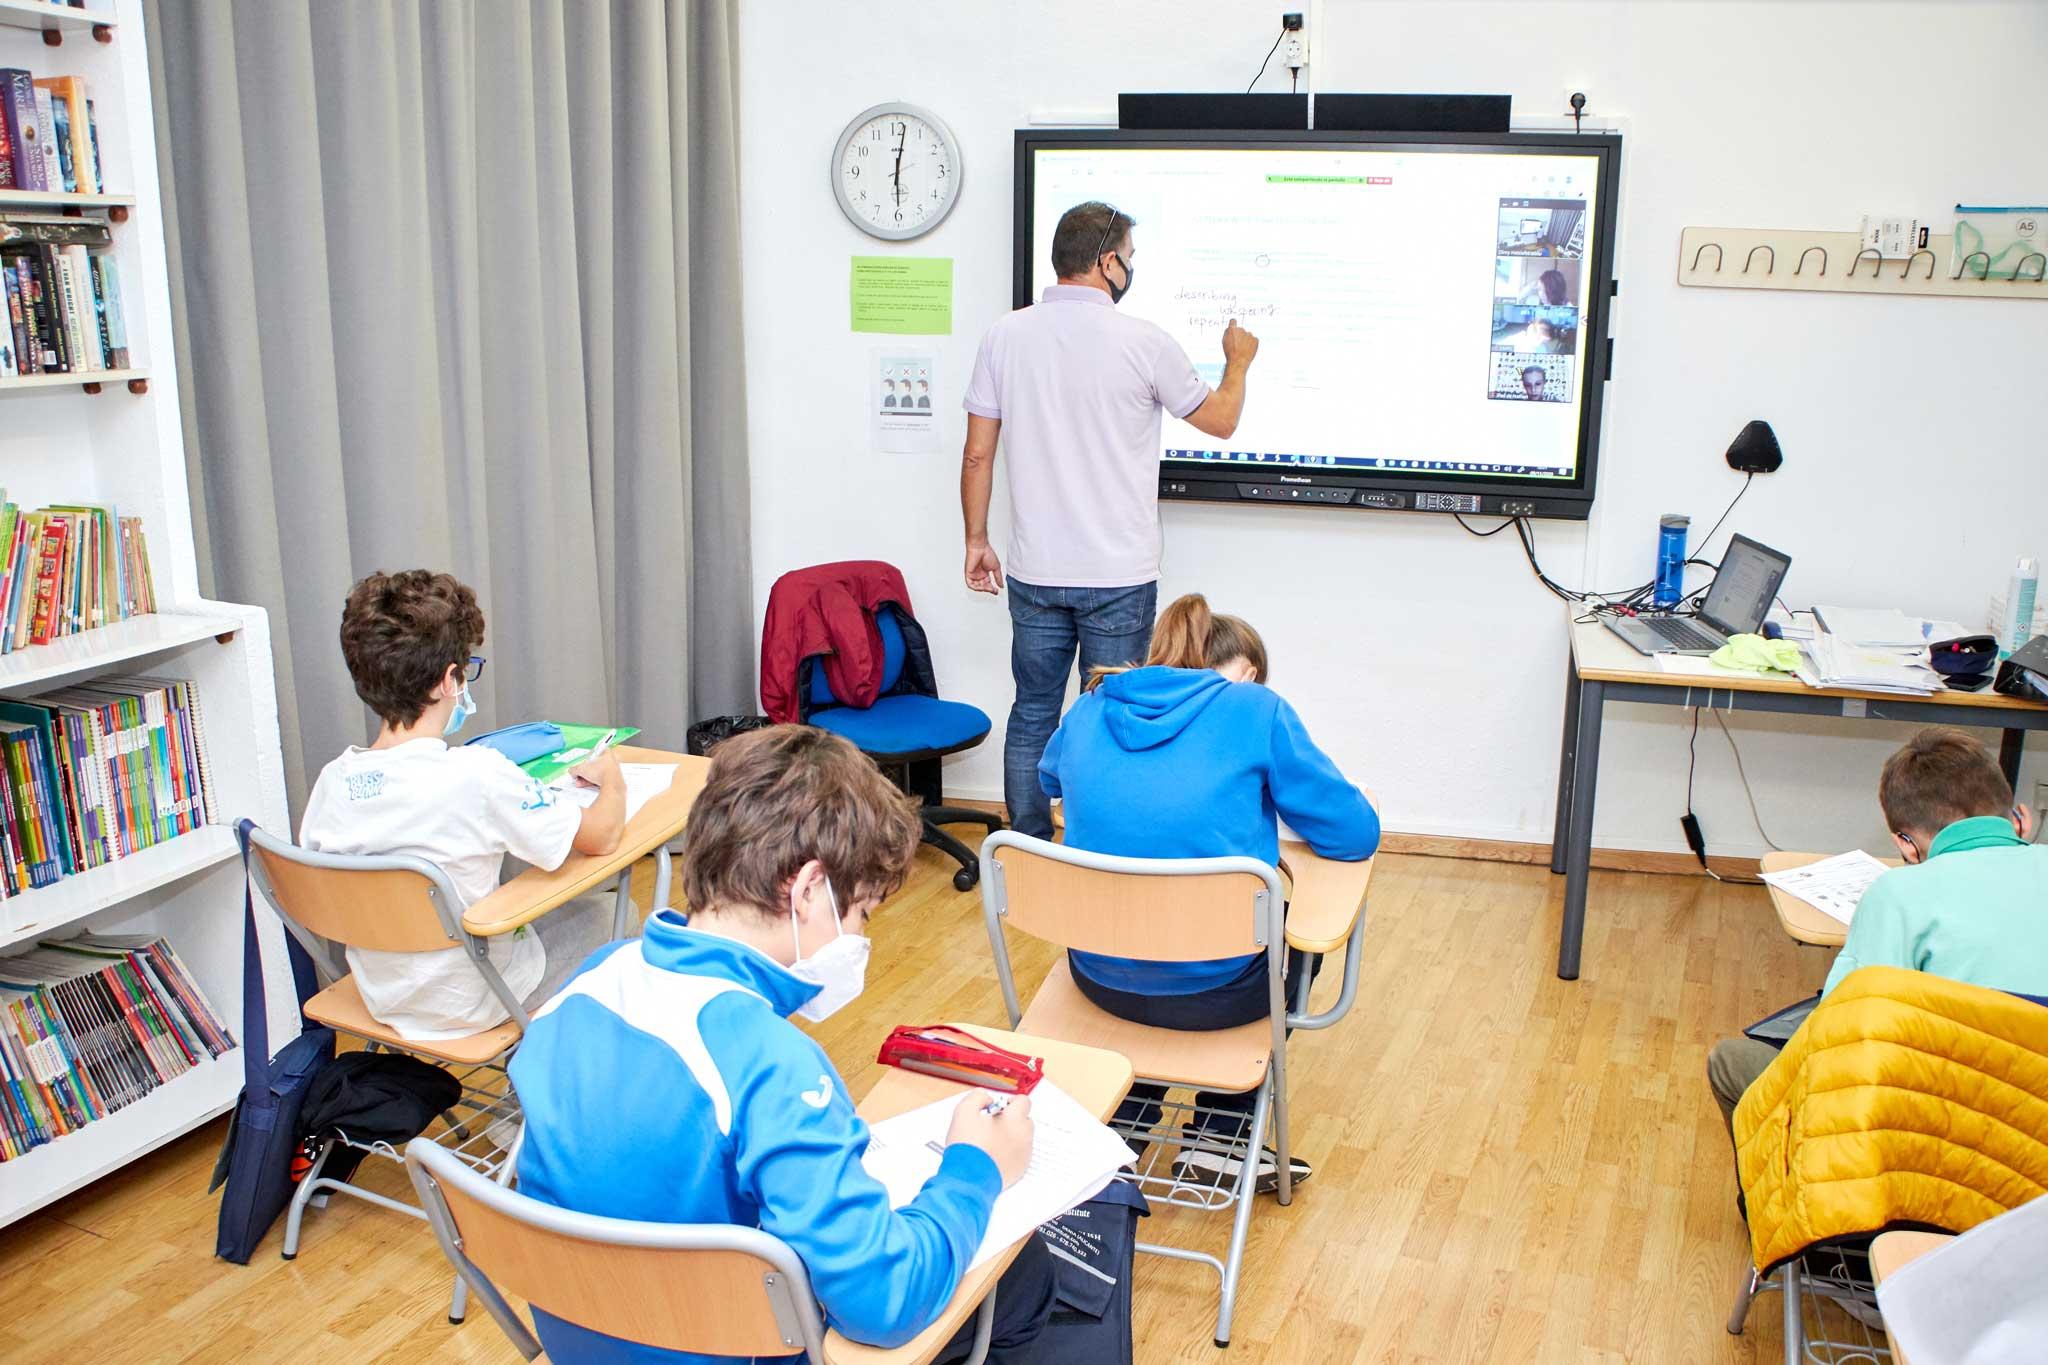 Aprender ingles en Denia – The English Institute